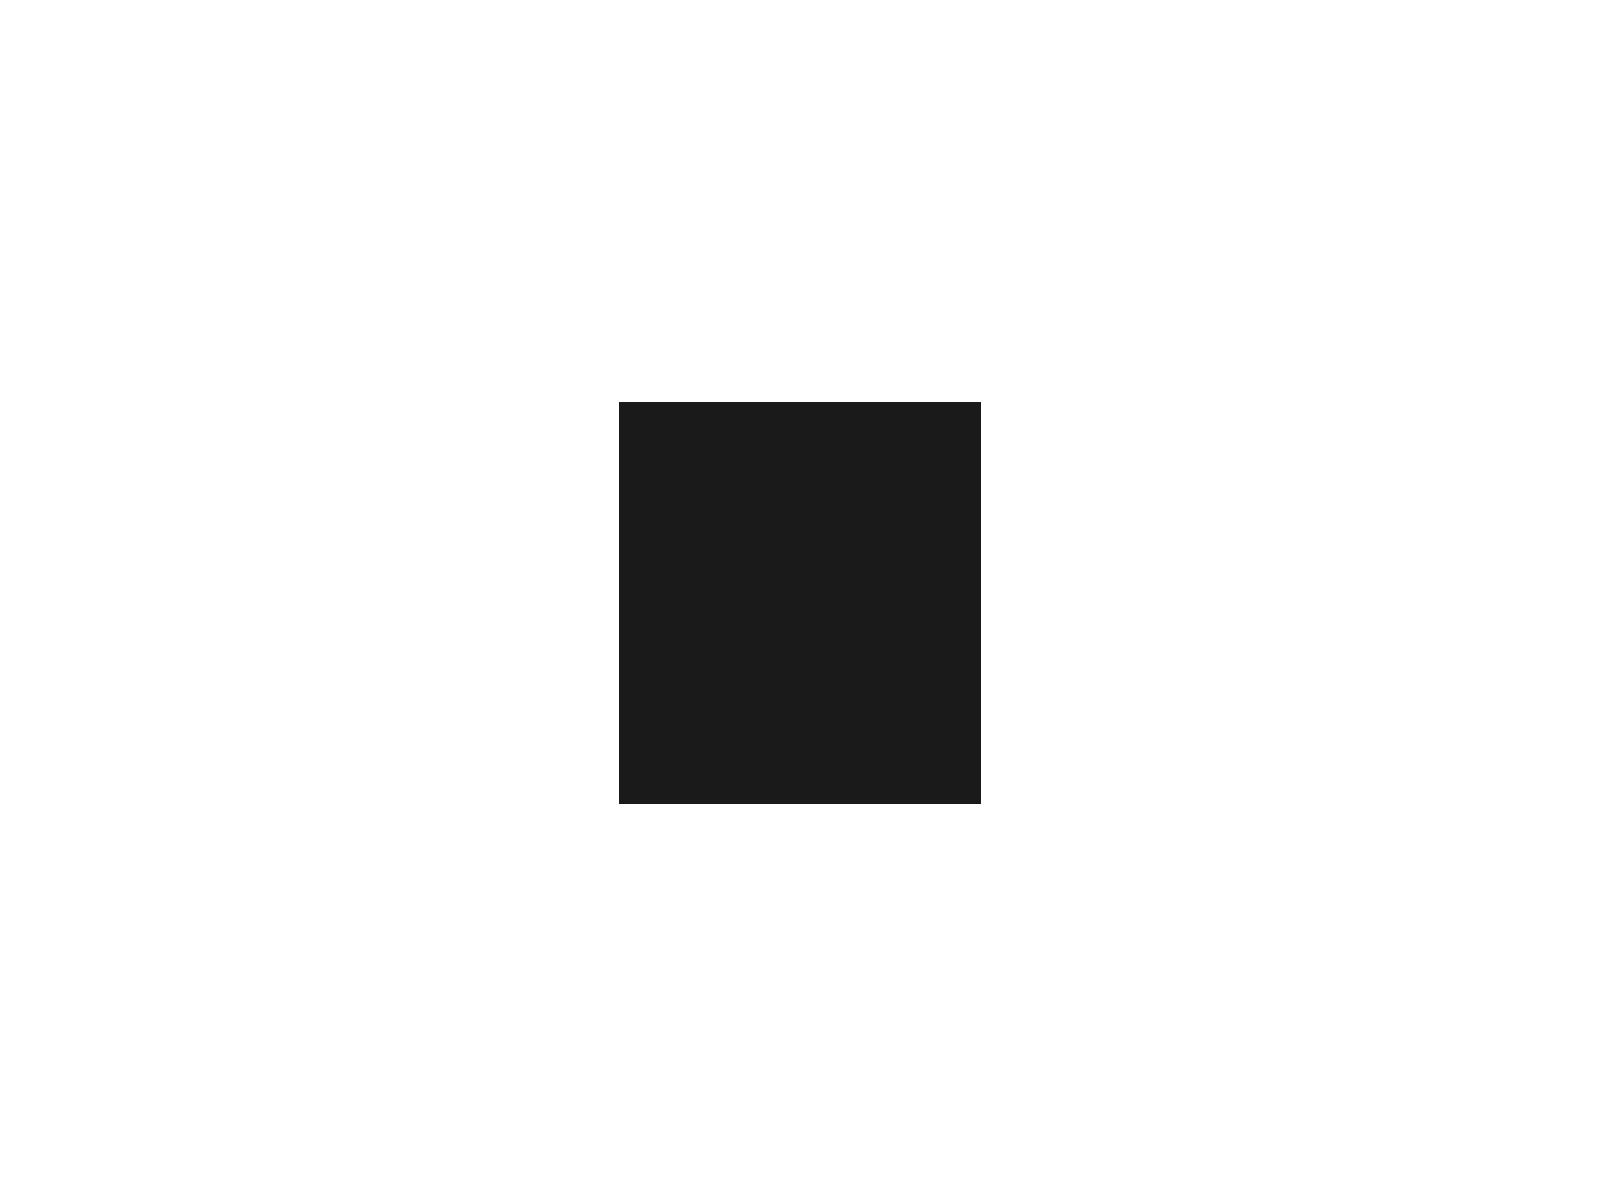 200325_logo_0022_Garuda